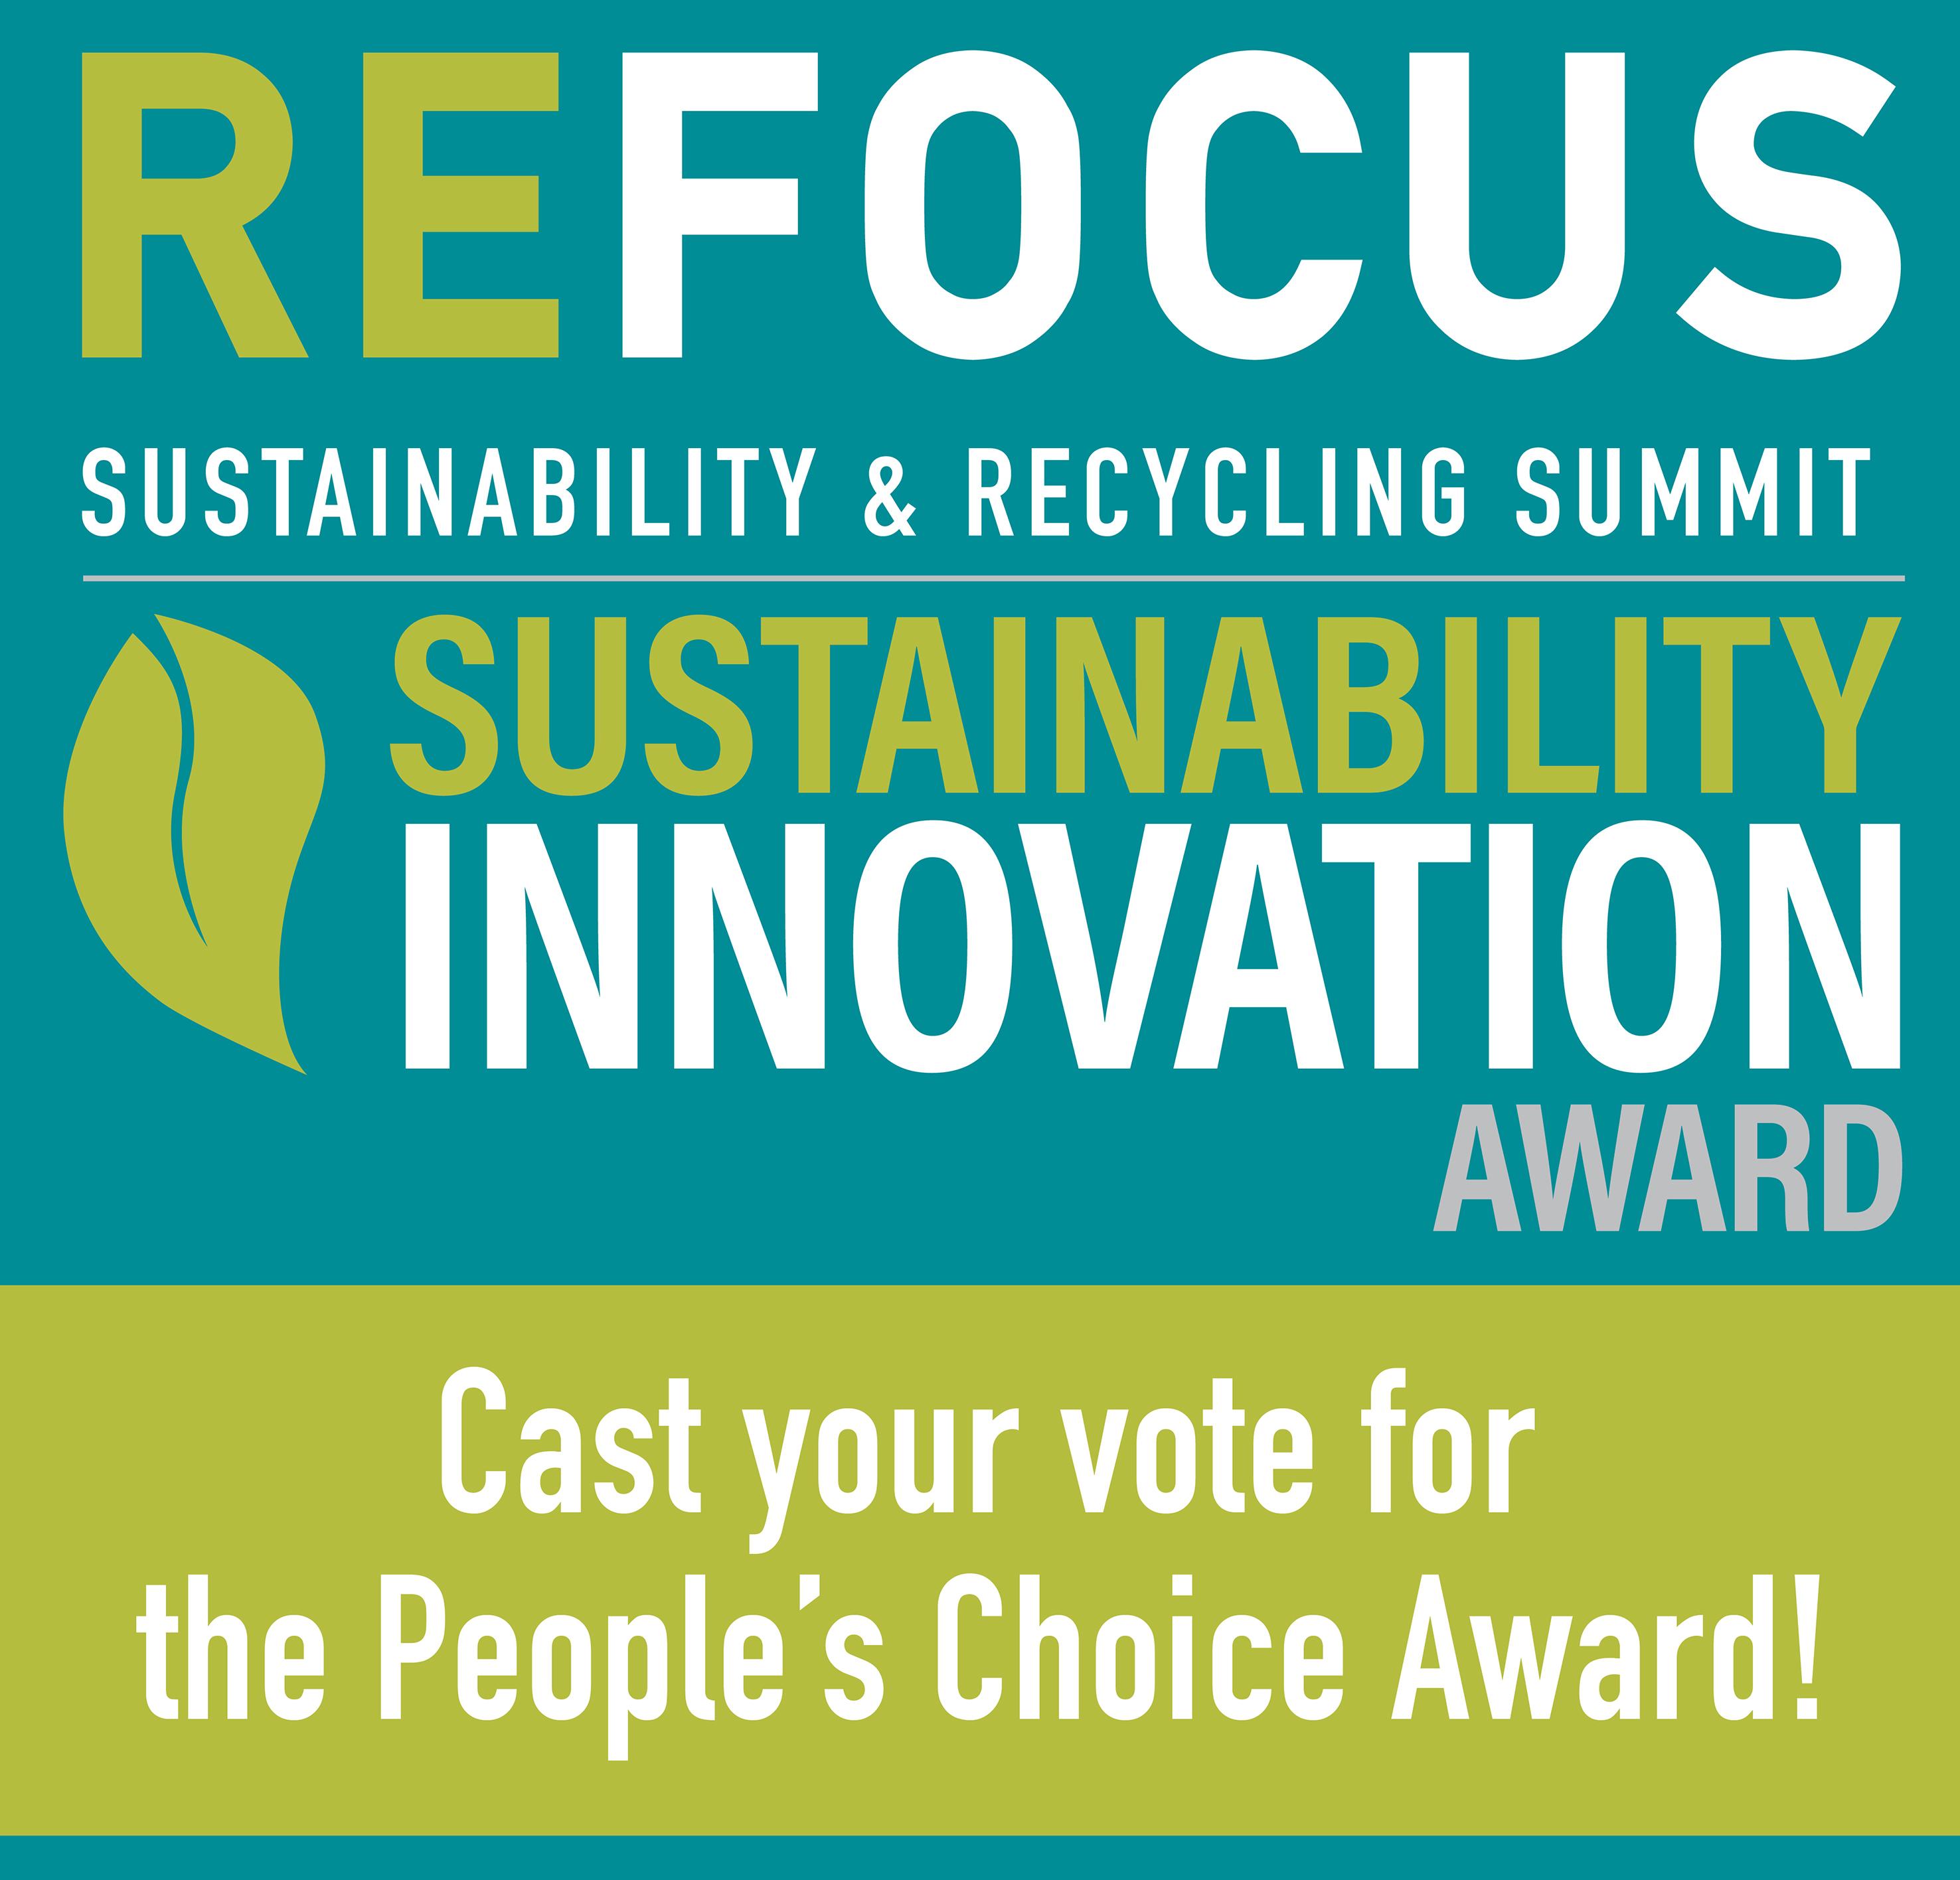 Refocus Sustainability Innovation Award